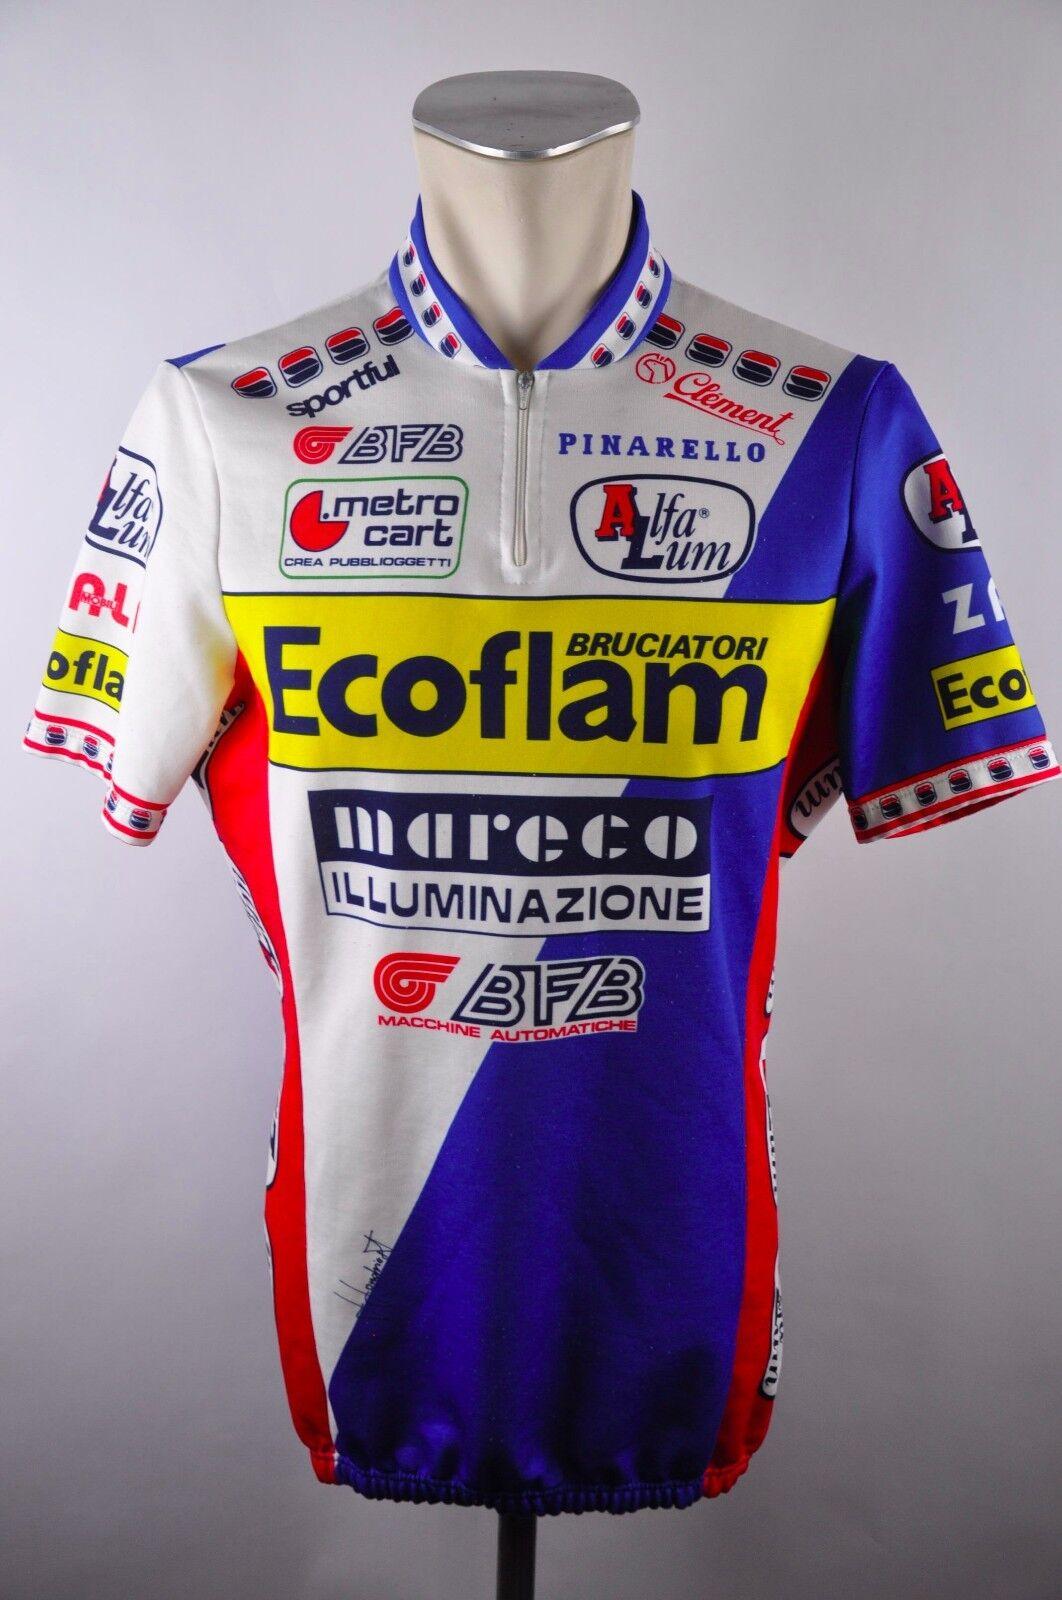 ECOFLAM Sportful 80er 90er cycling maglia Rad Trikot Gr. XL 56cm 01E